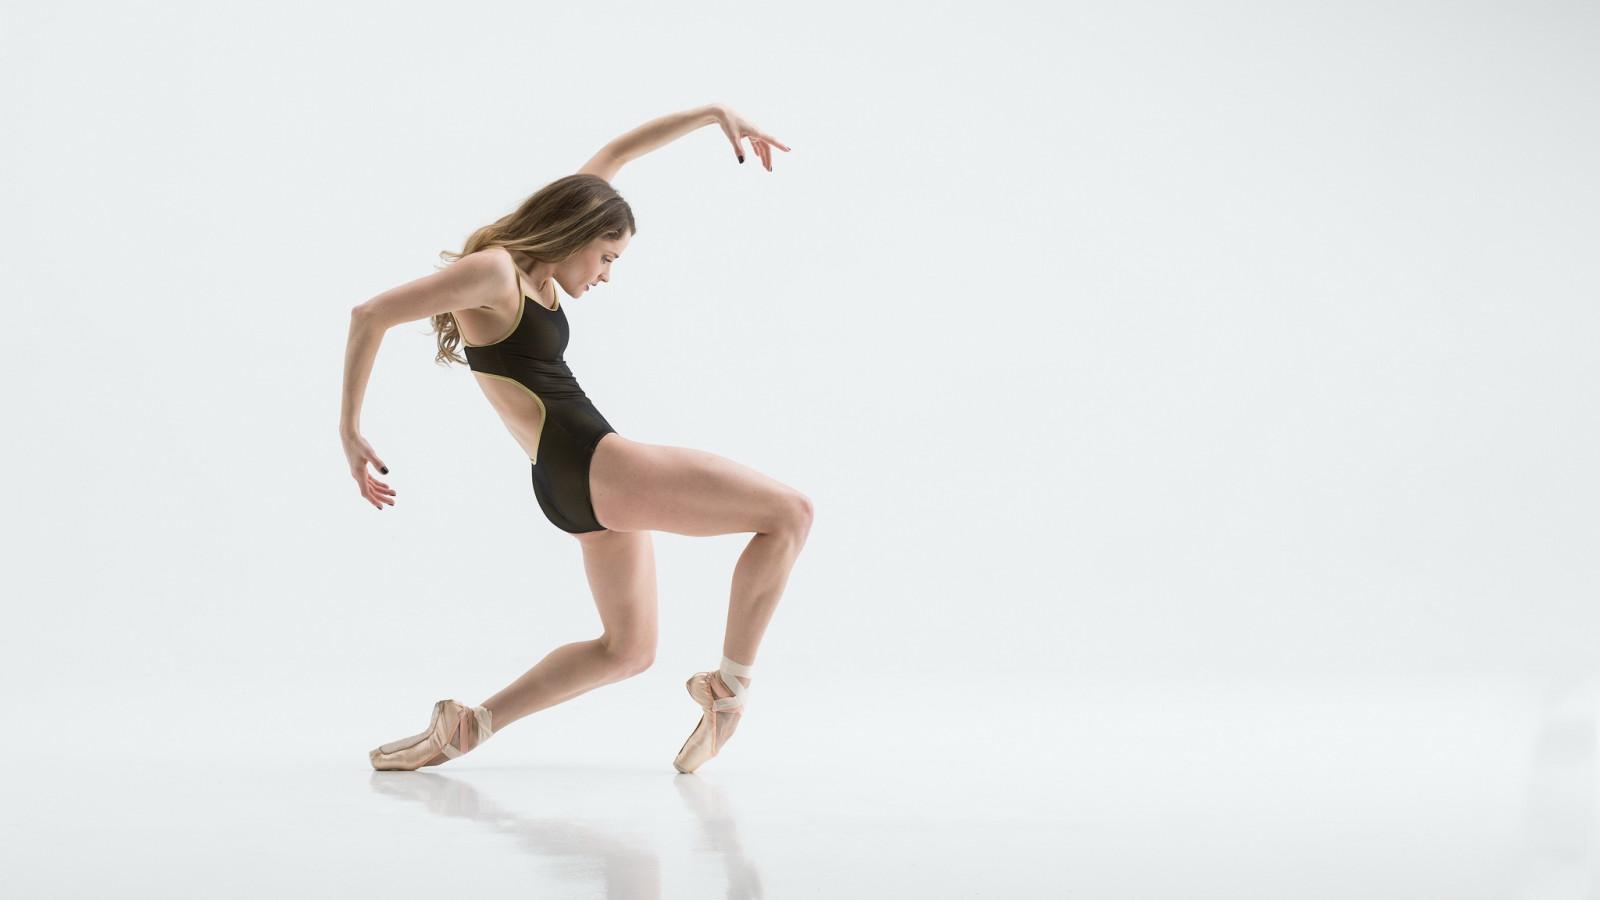 Wallpaper : women, dancer, flexible, simple background, ballet slippers 2048x1152 ...